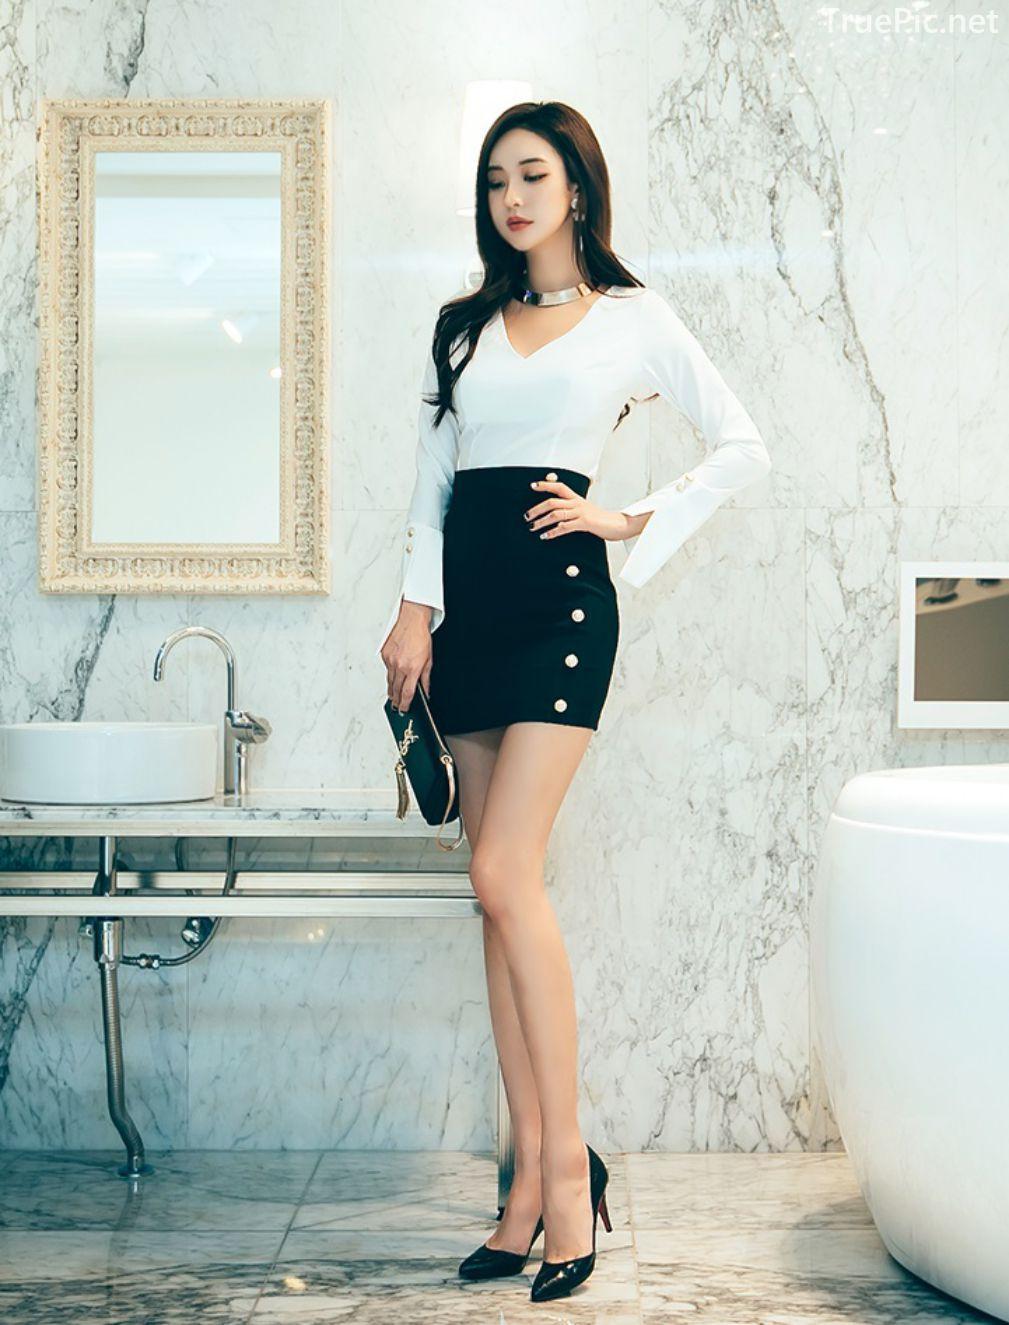 Korean Fashion Model - Park Da Hyun - Indoor Photoshoot Collection - TruePic.net - Picture 7